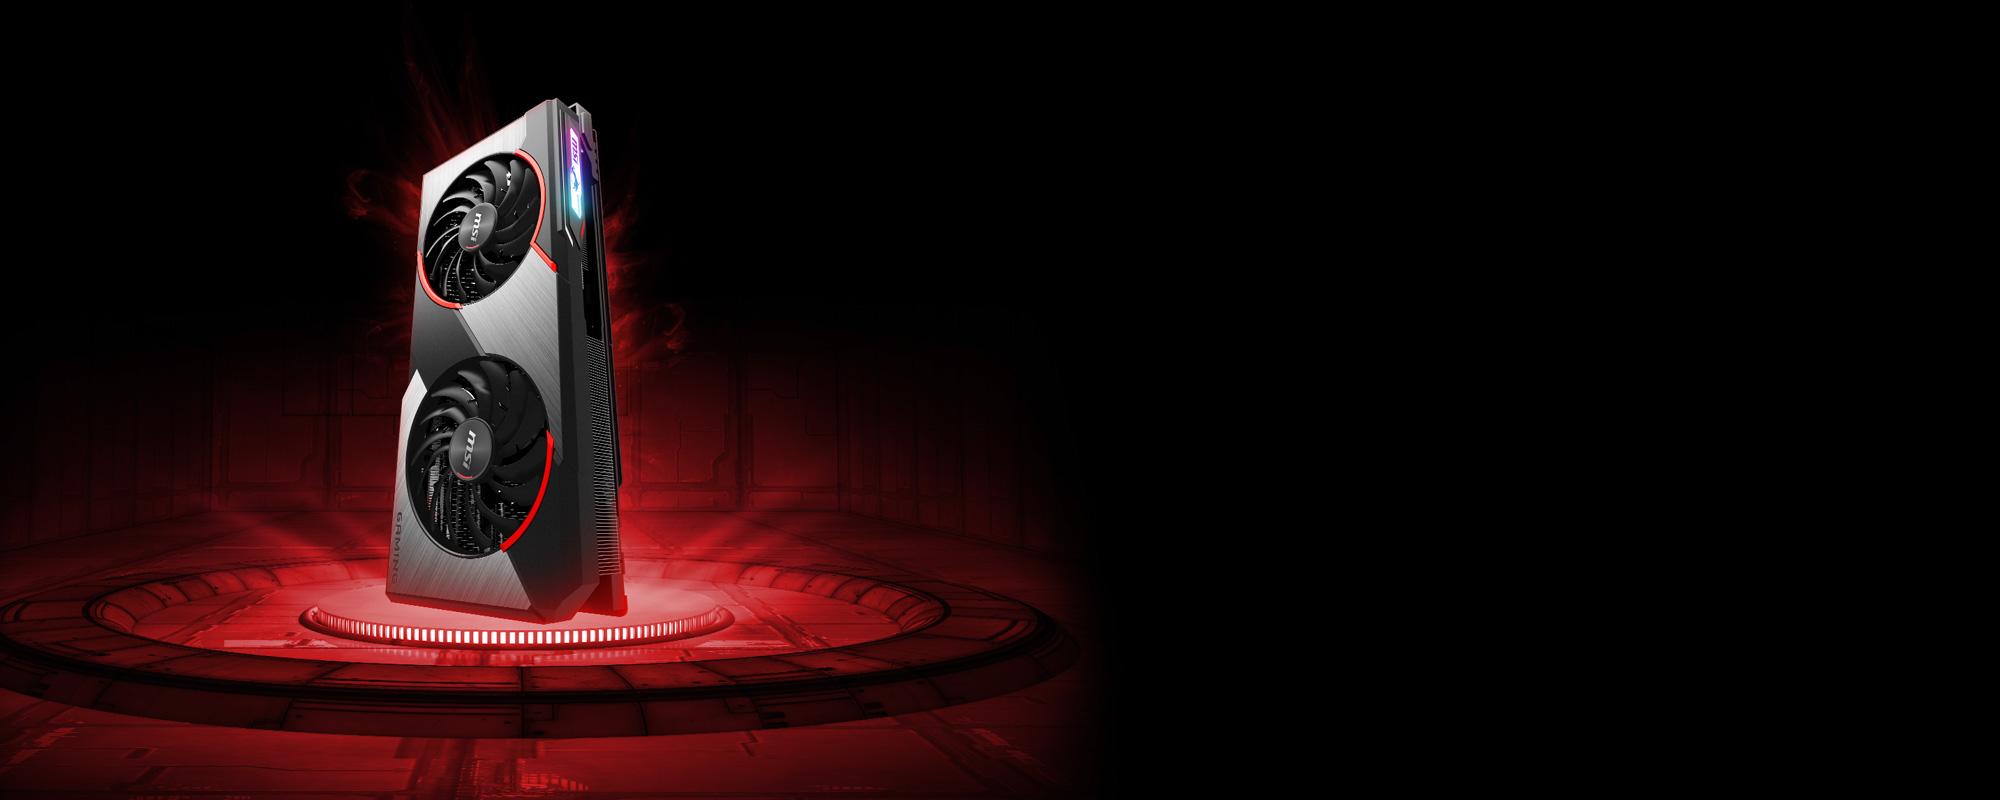 Radeon-RX-5700-XT-GAMING-X